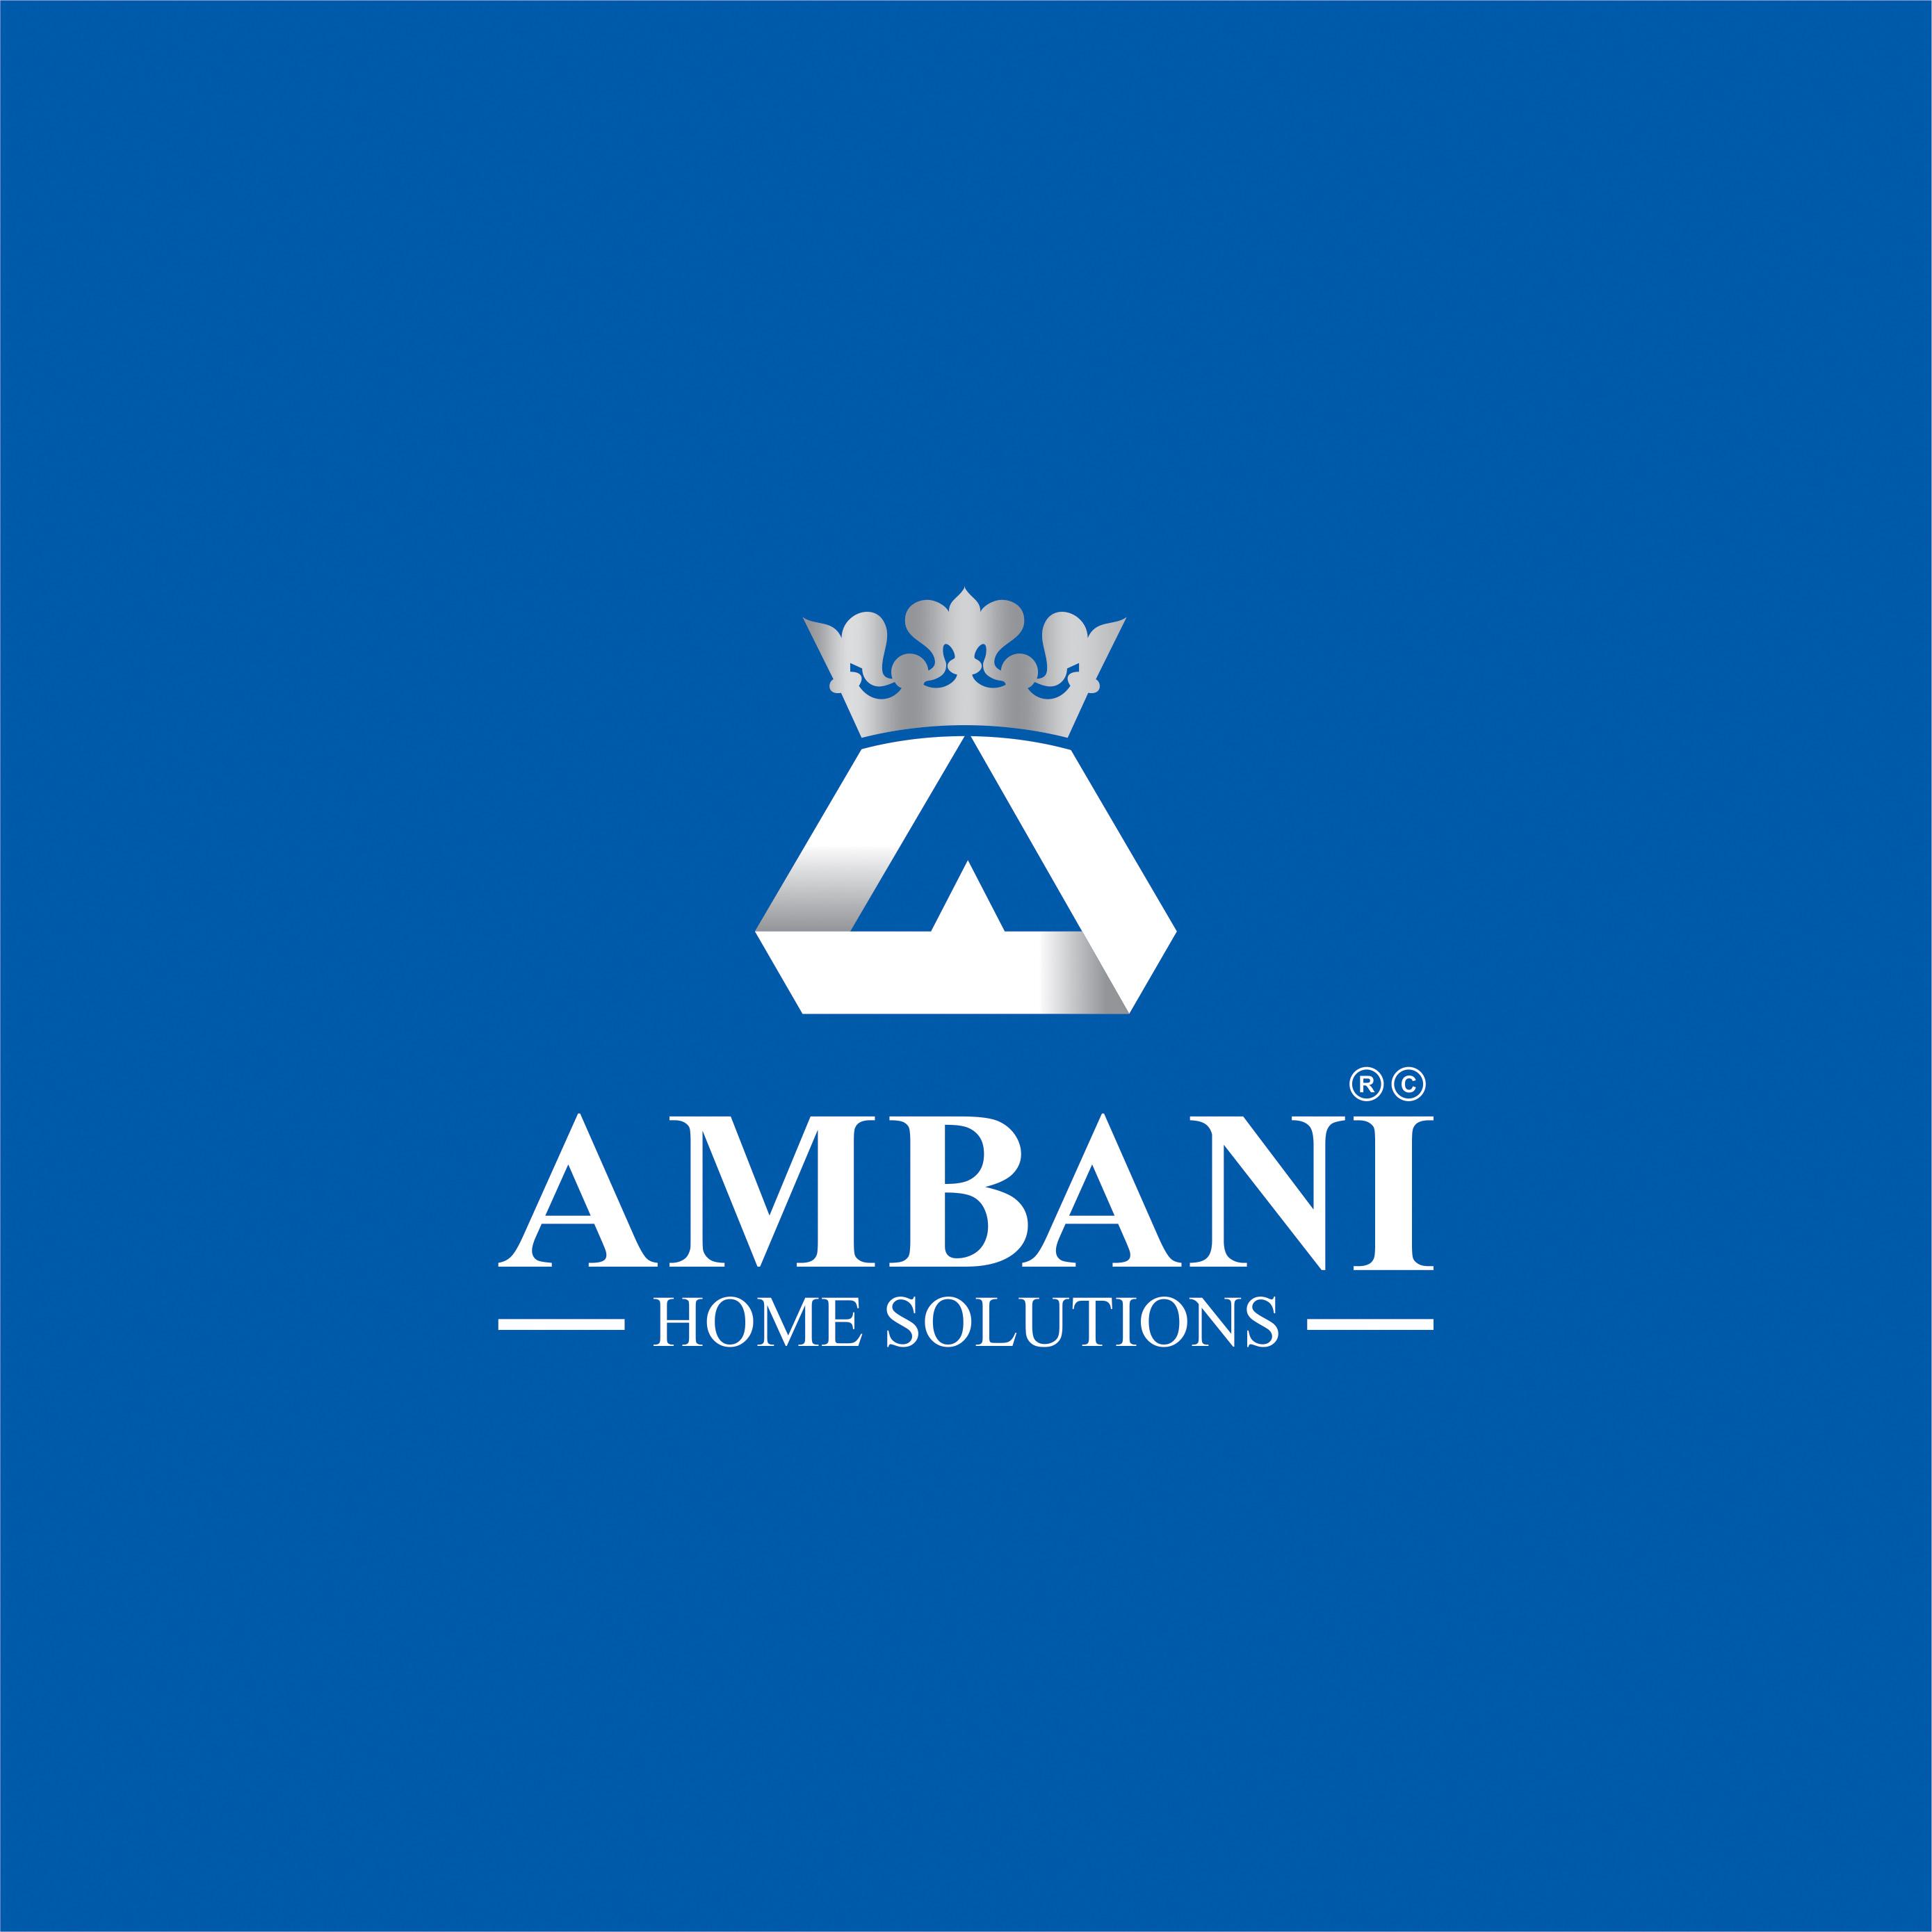 Ambani Home Solutions Pvt. Ltd.